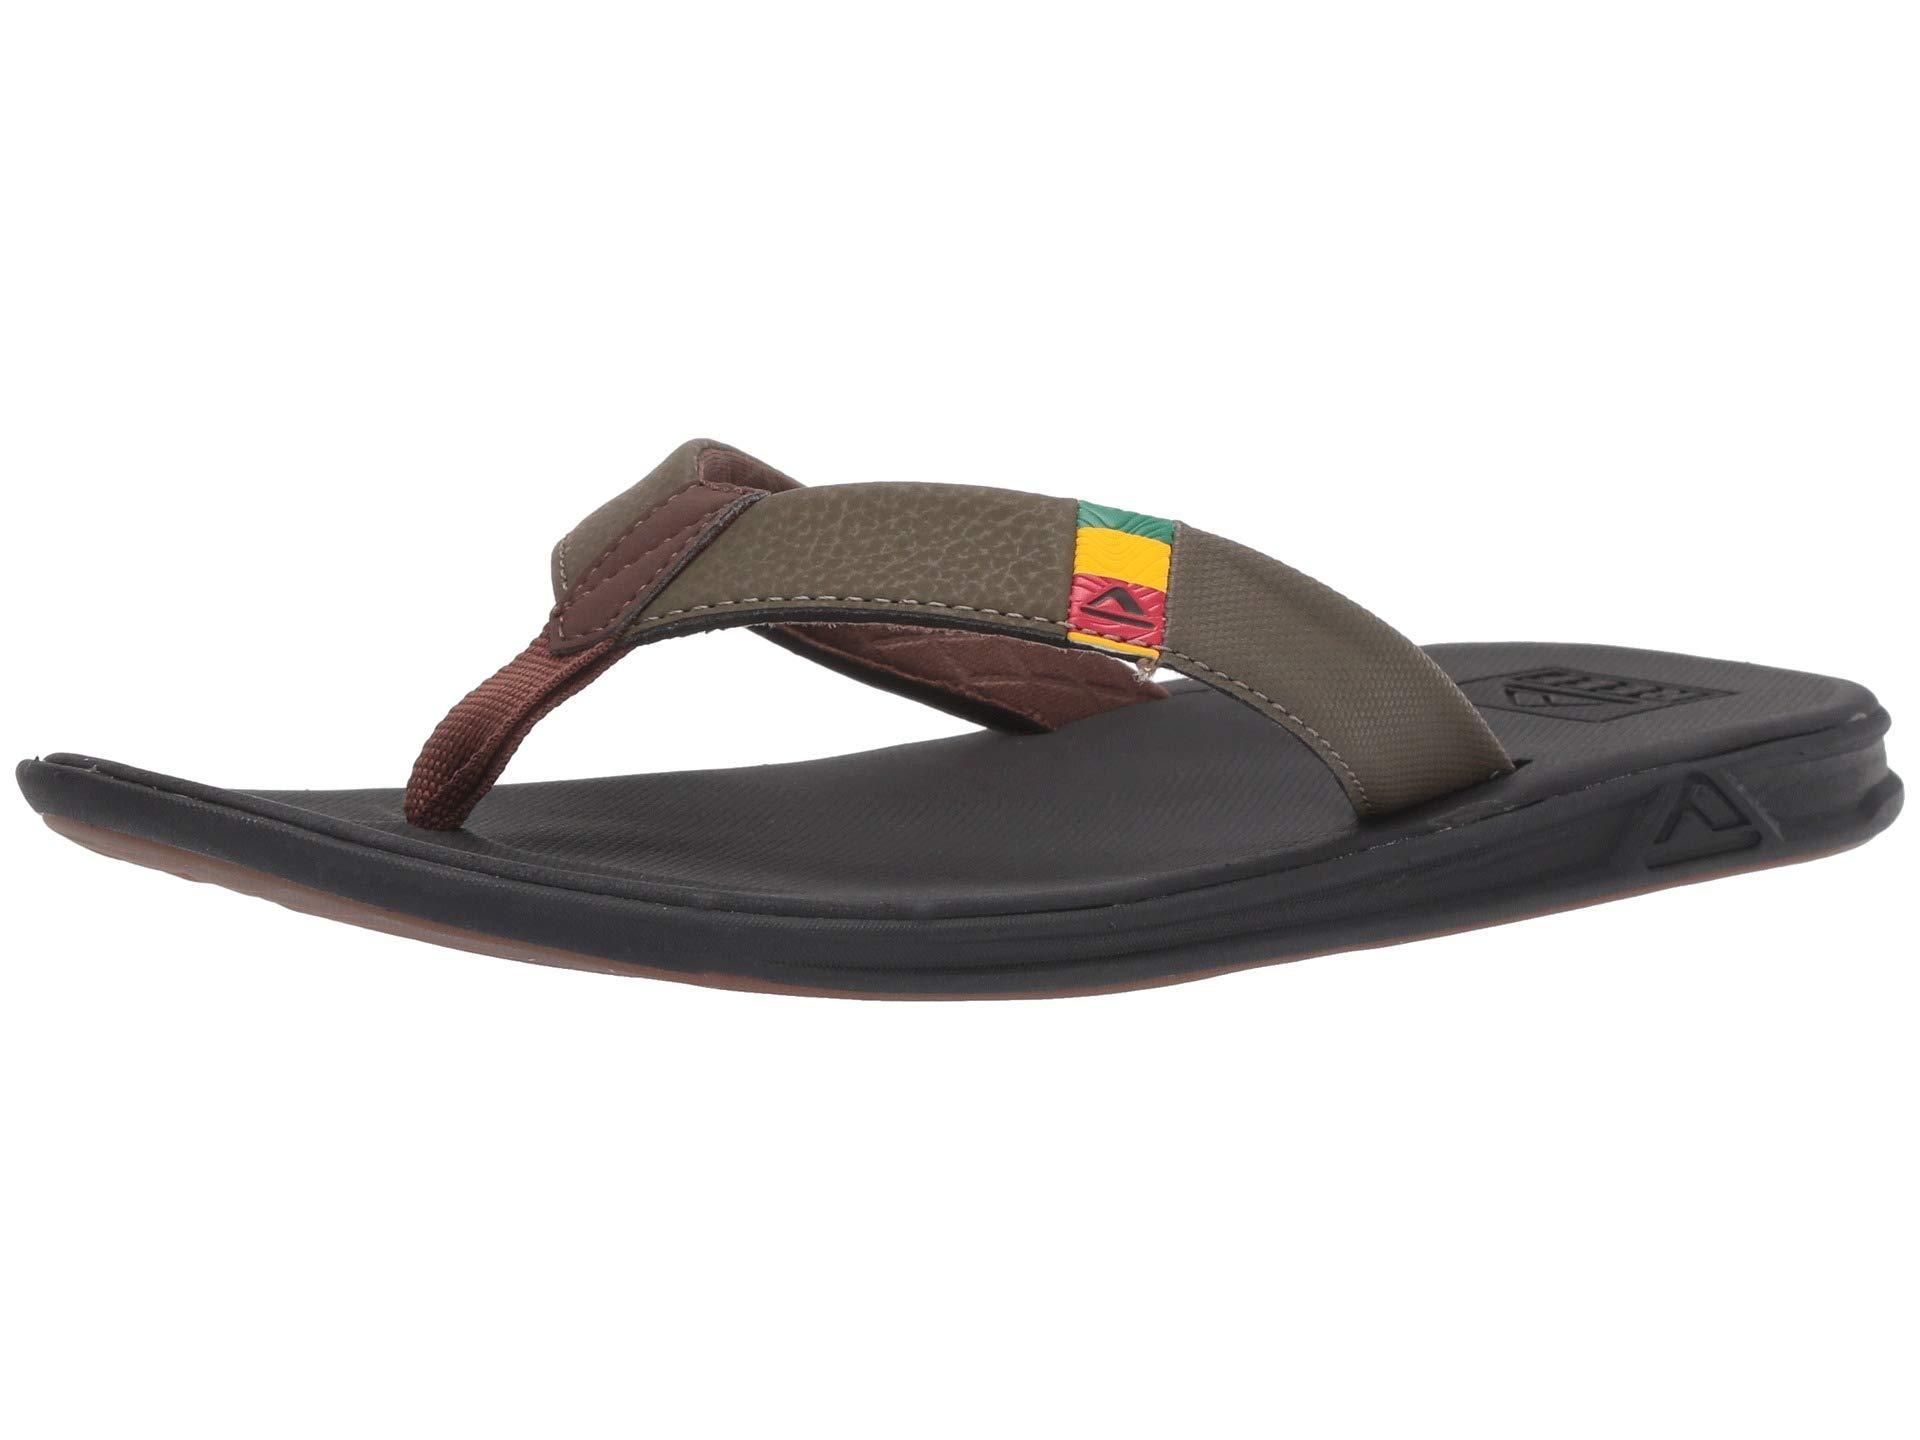 8eeb32768bfc Lyst - Reef Slammed Rover (black tan) Men s Sandals for Men